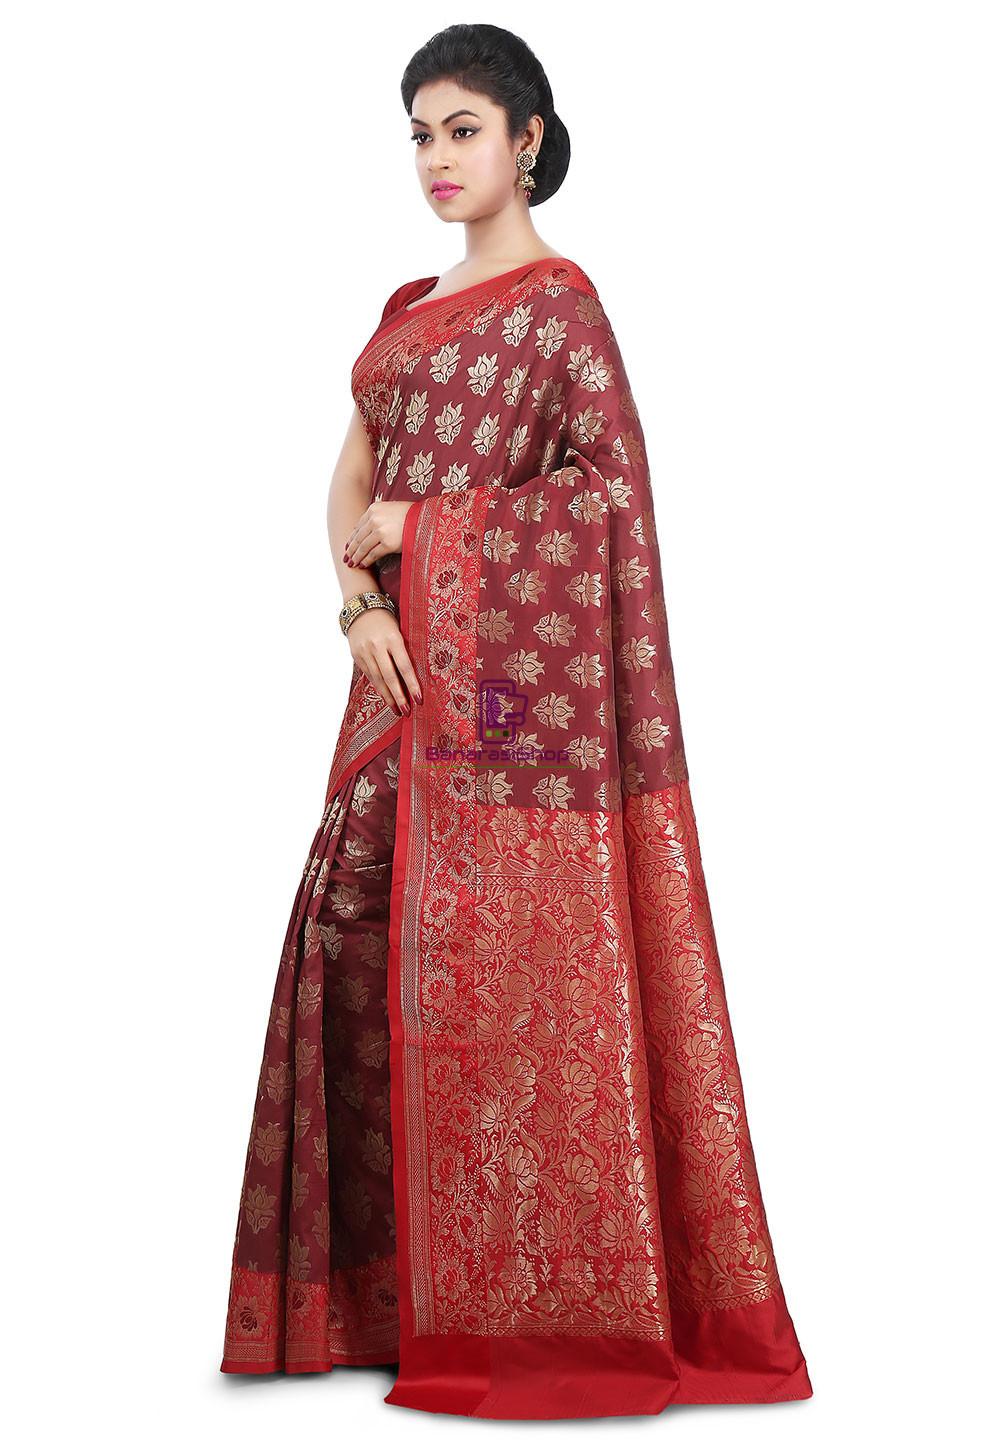 Woven Banarasi Art Silk Saree in Maroon and Red 5